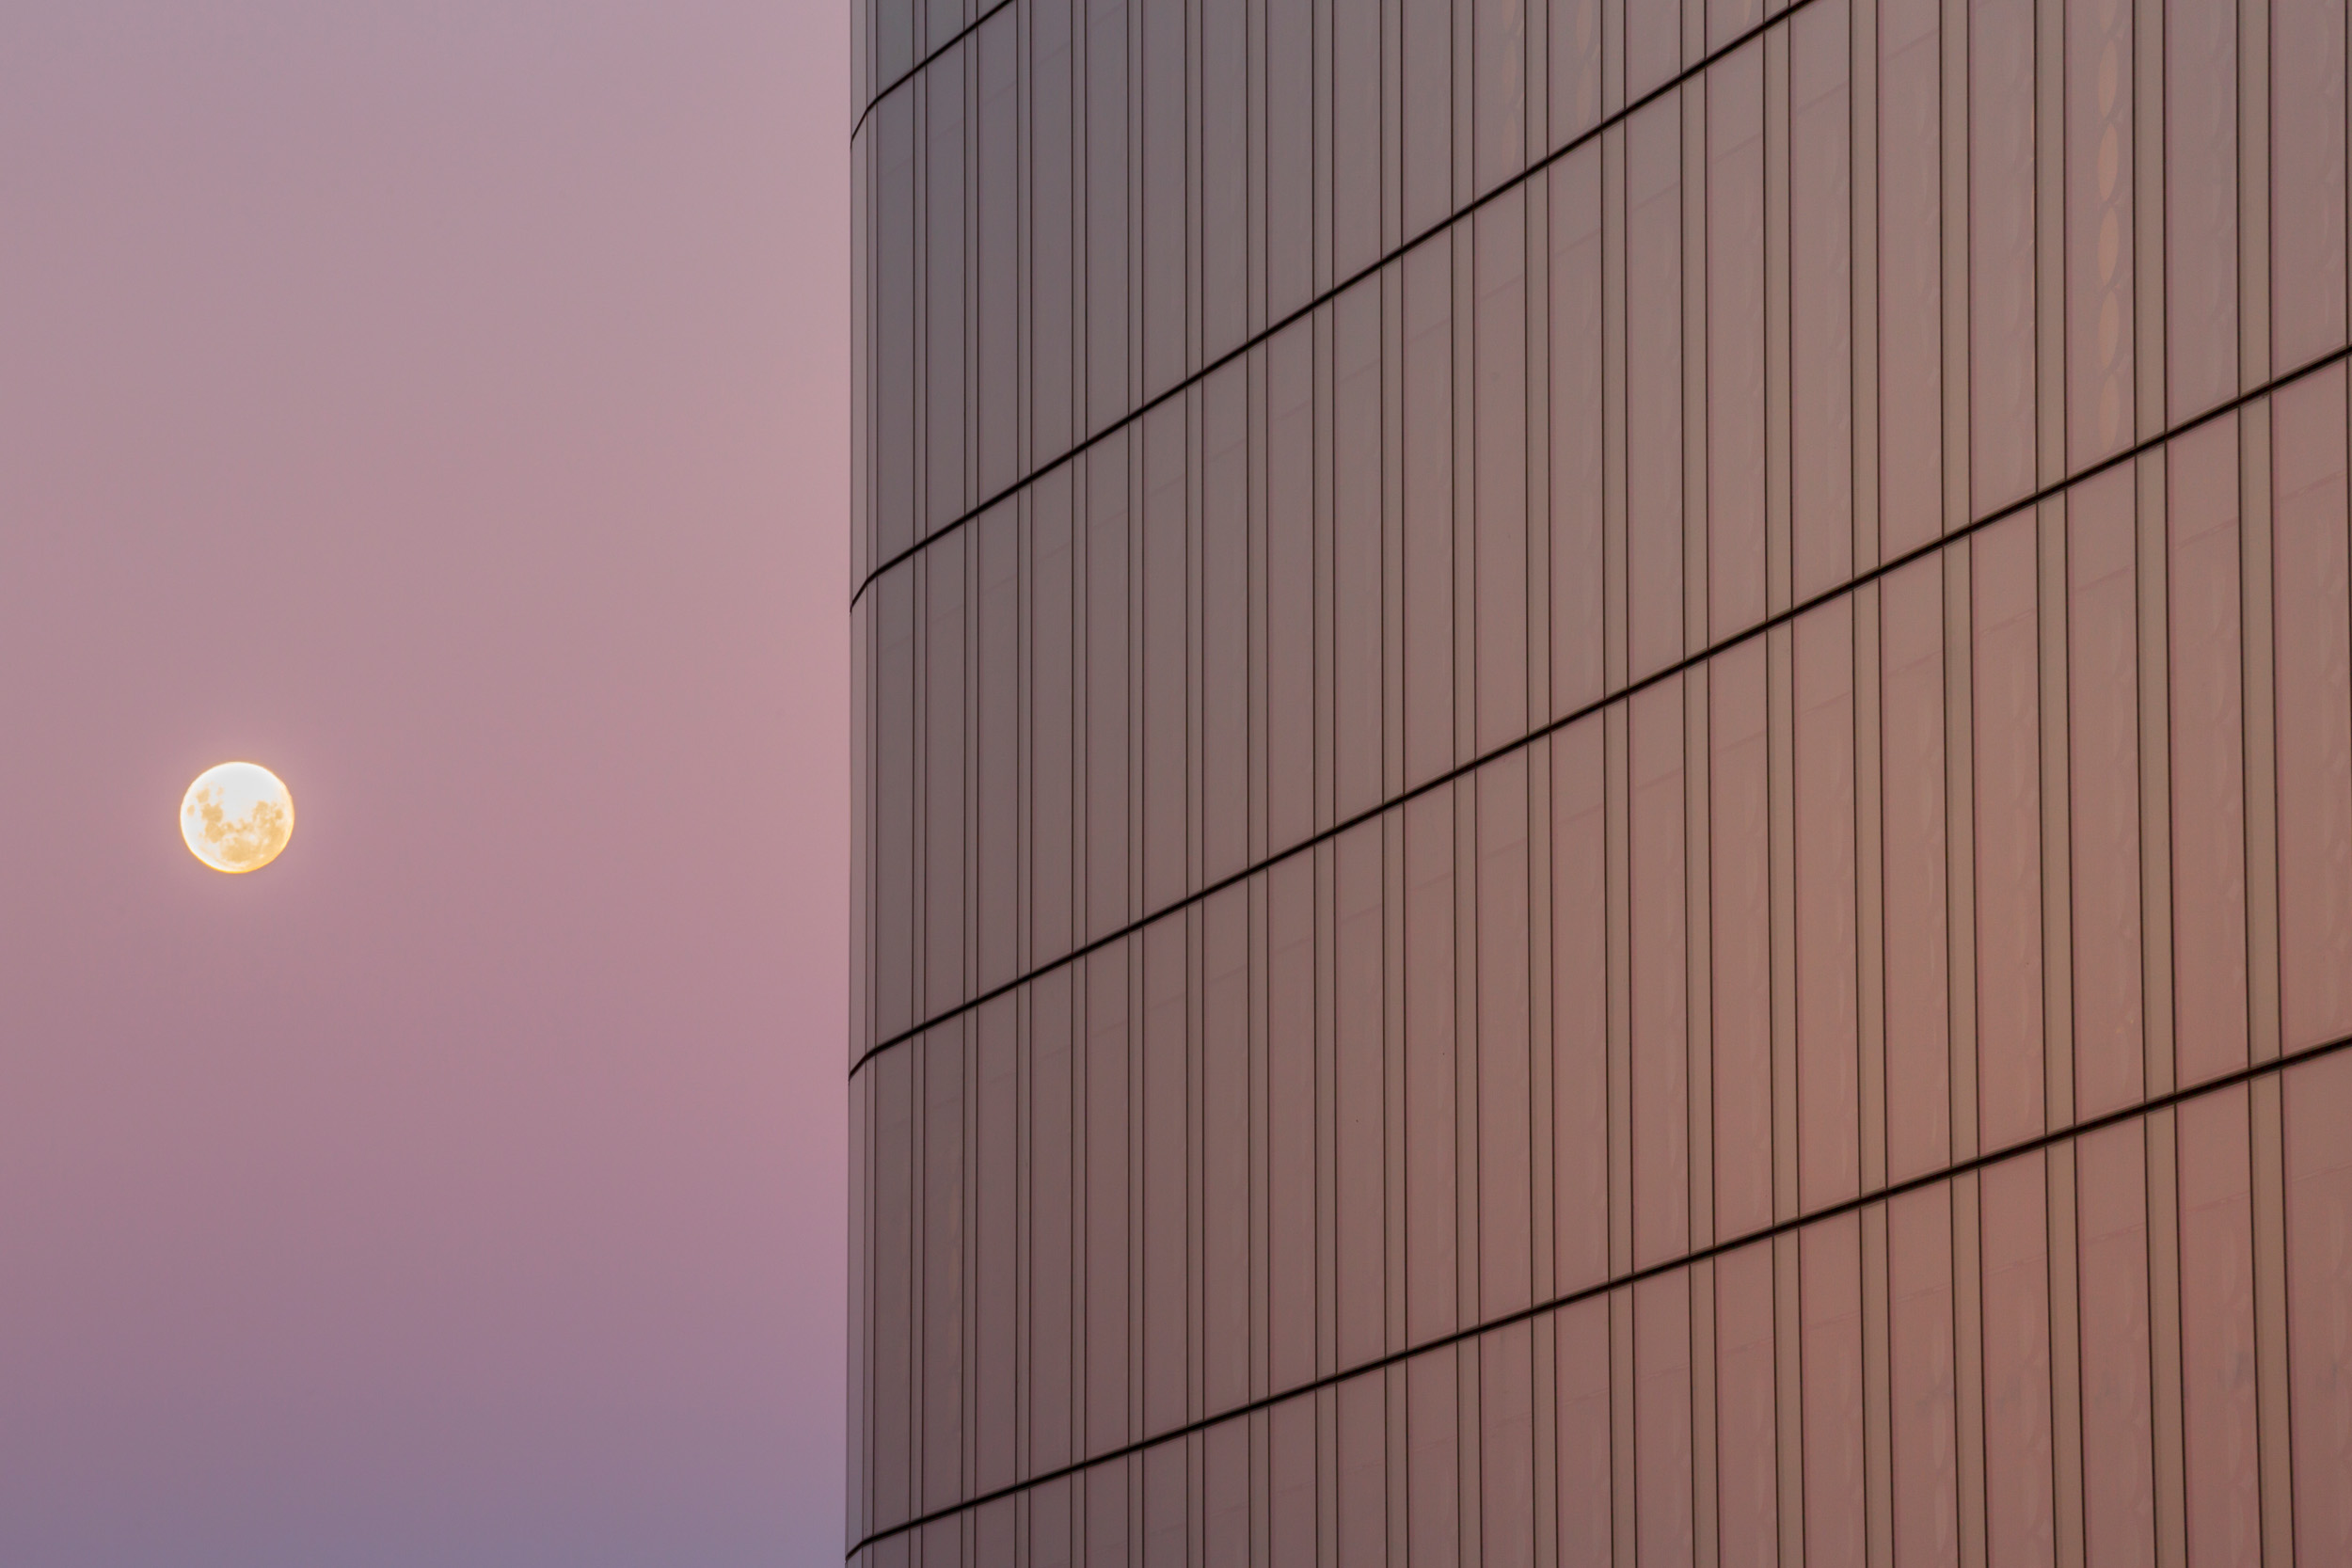 Jem_Cresswell_Architecture_Commercial_Photographer_Sydney_Australia_006.jpg